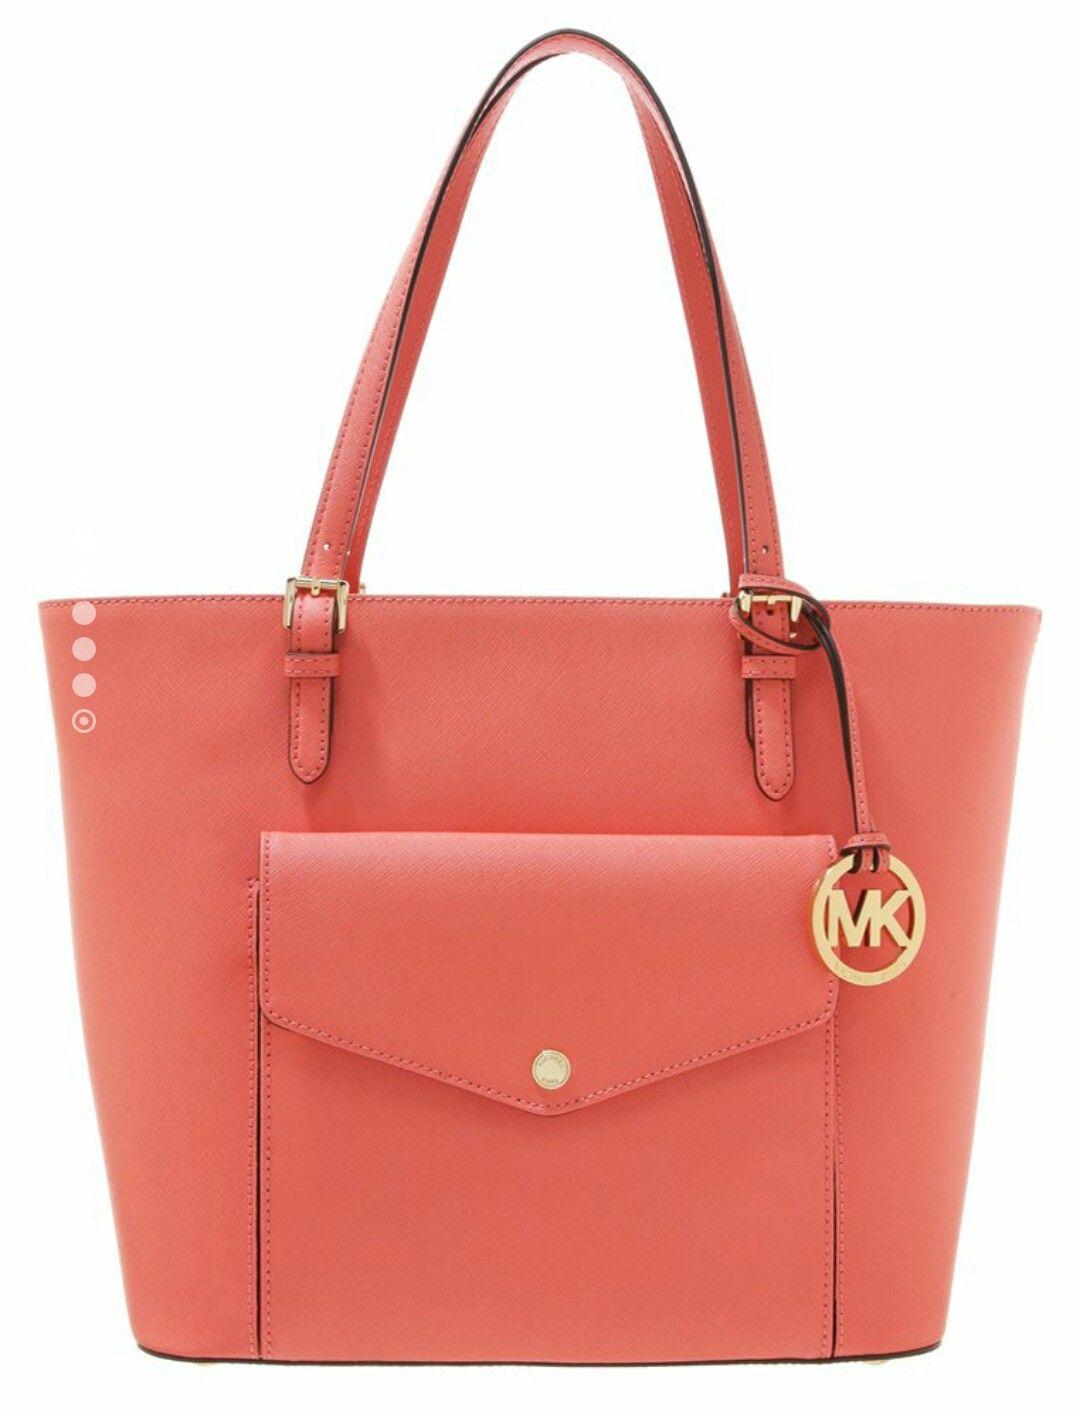 8a83c76265 Lauren Ralph Lauren CRAWLEY - Tote bag - red £170.00    style  ClothingSale